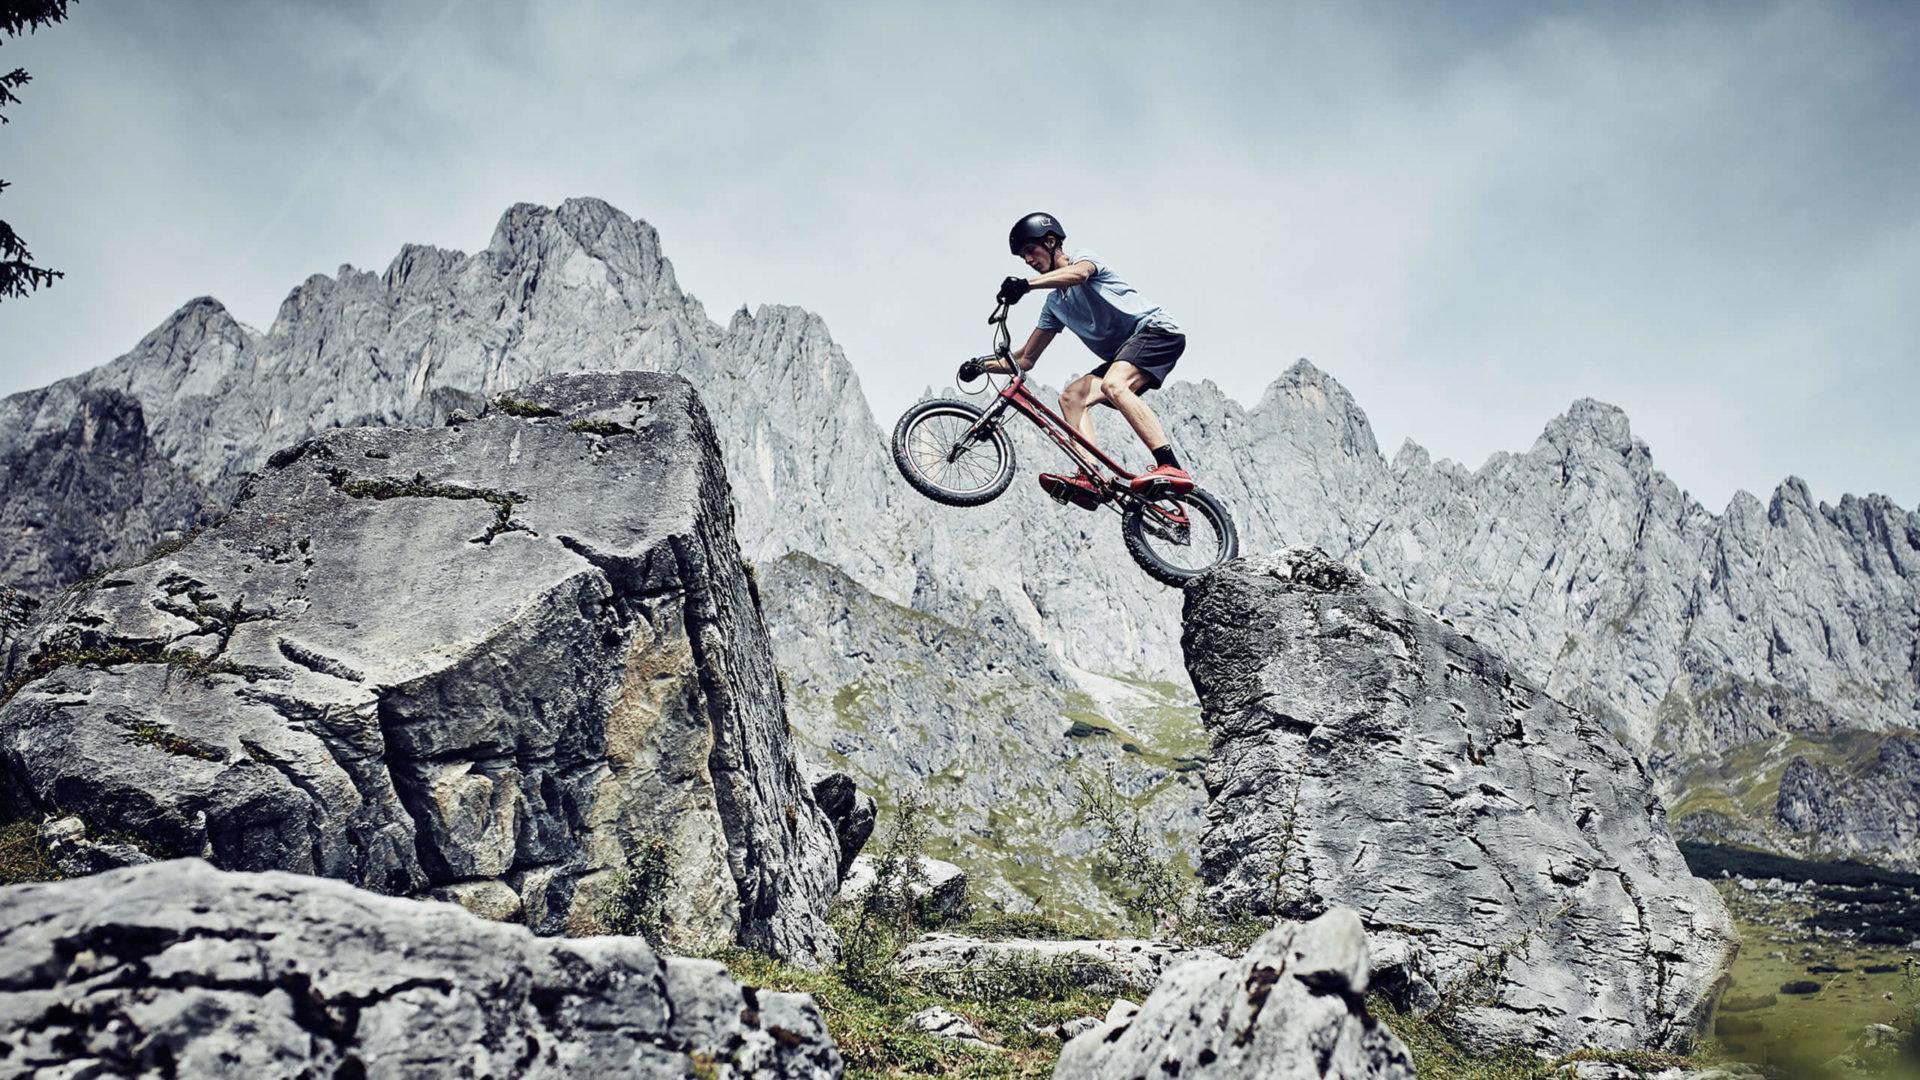 Thomas Klausner Professional Trail Biker